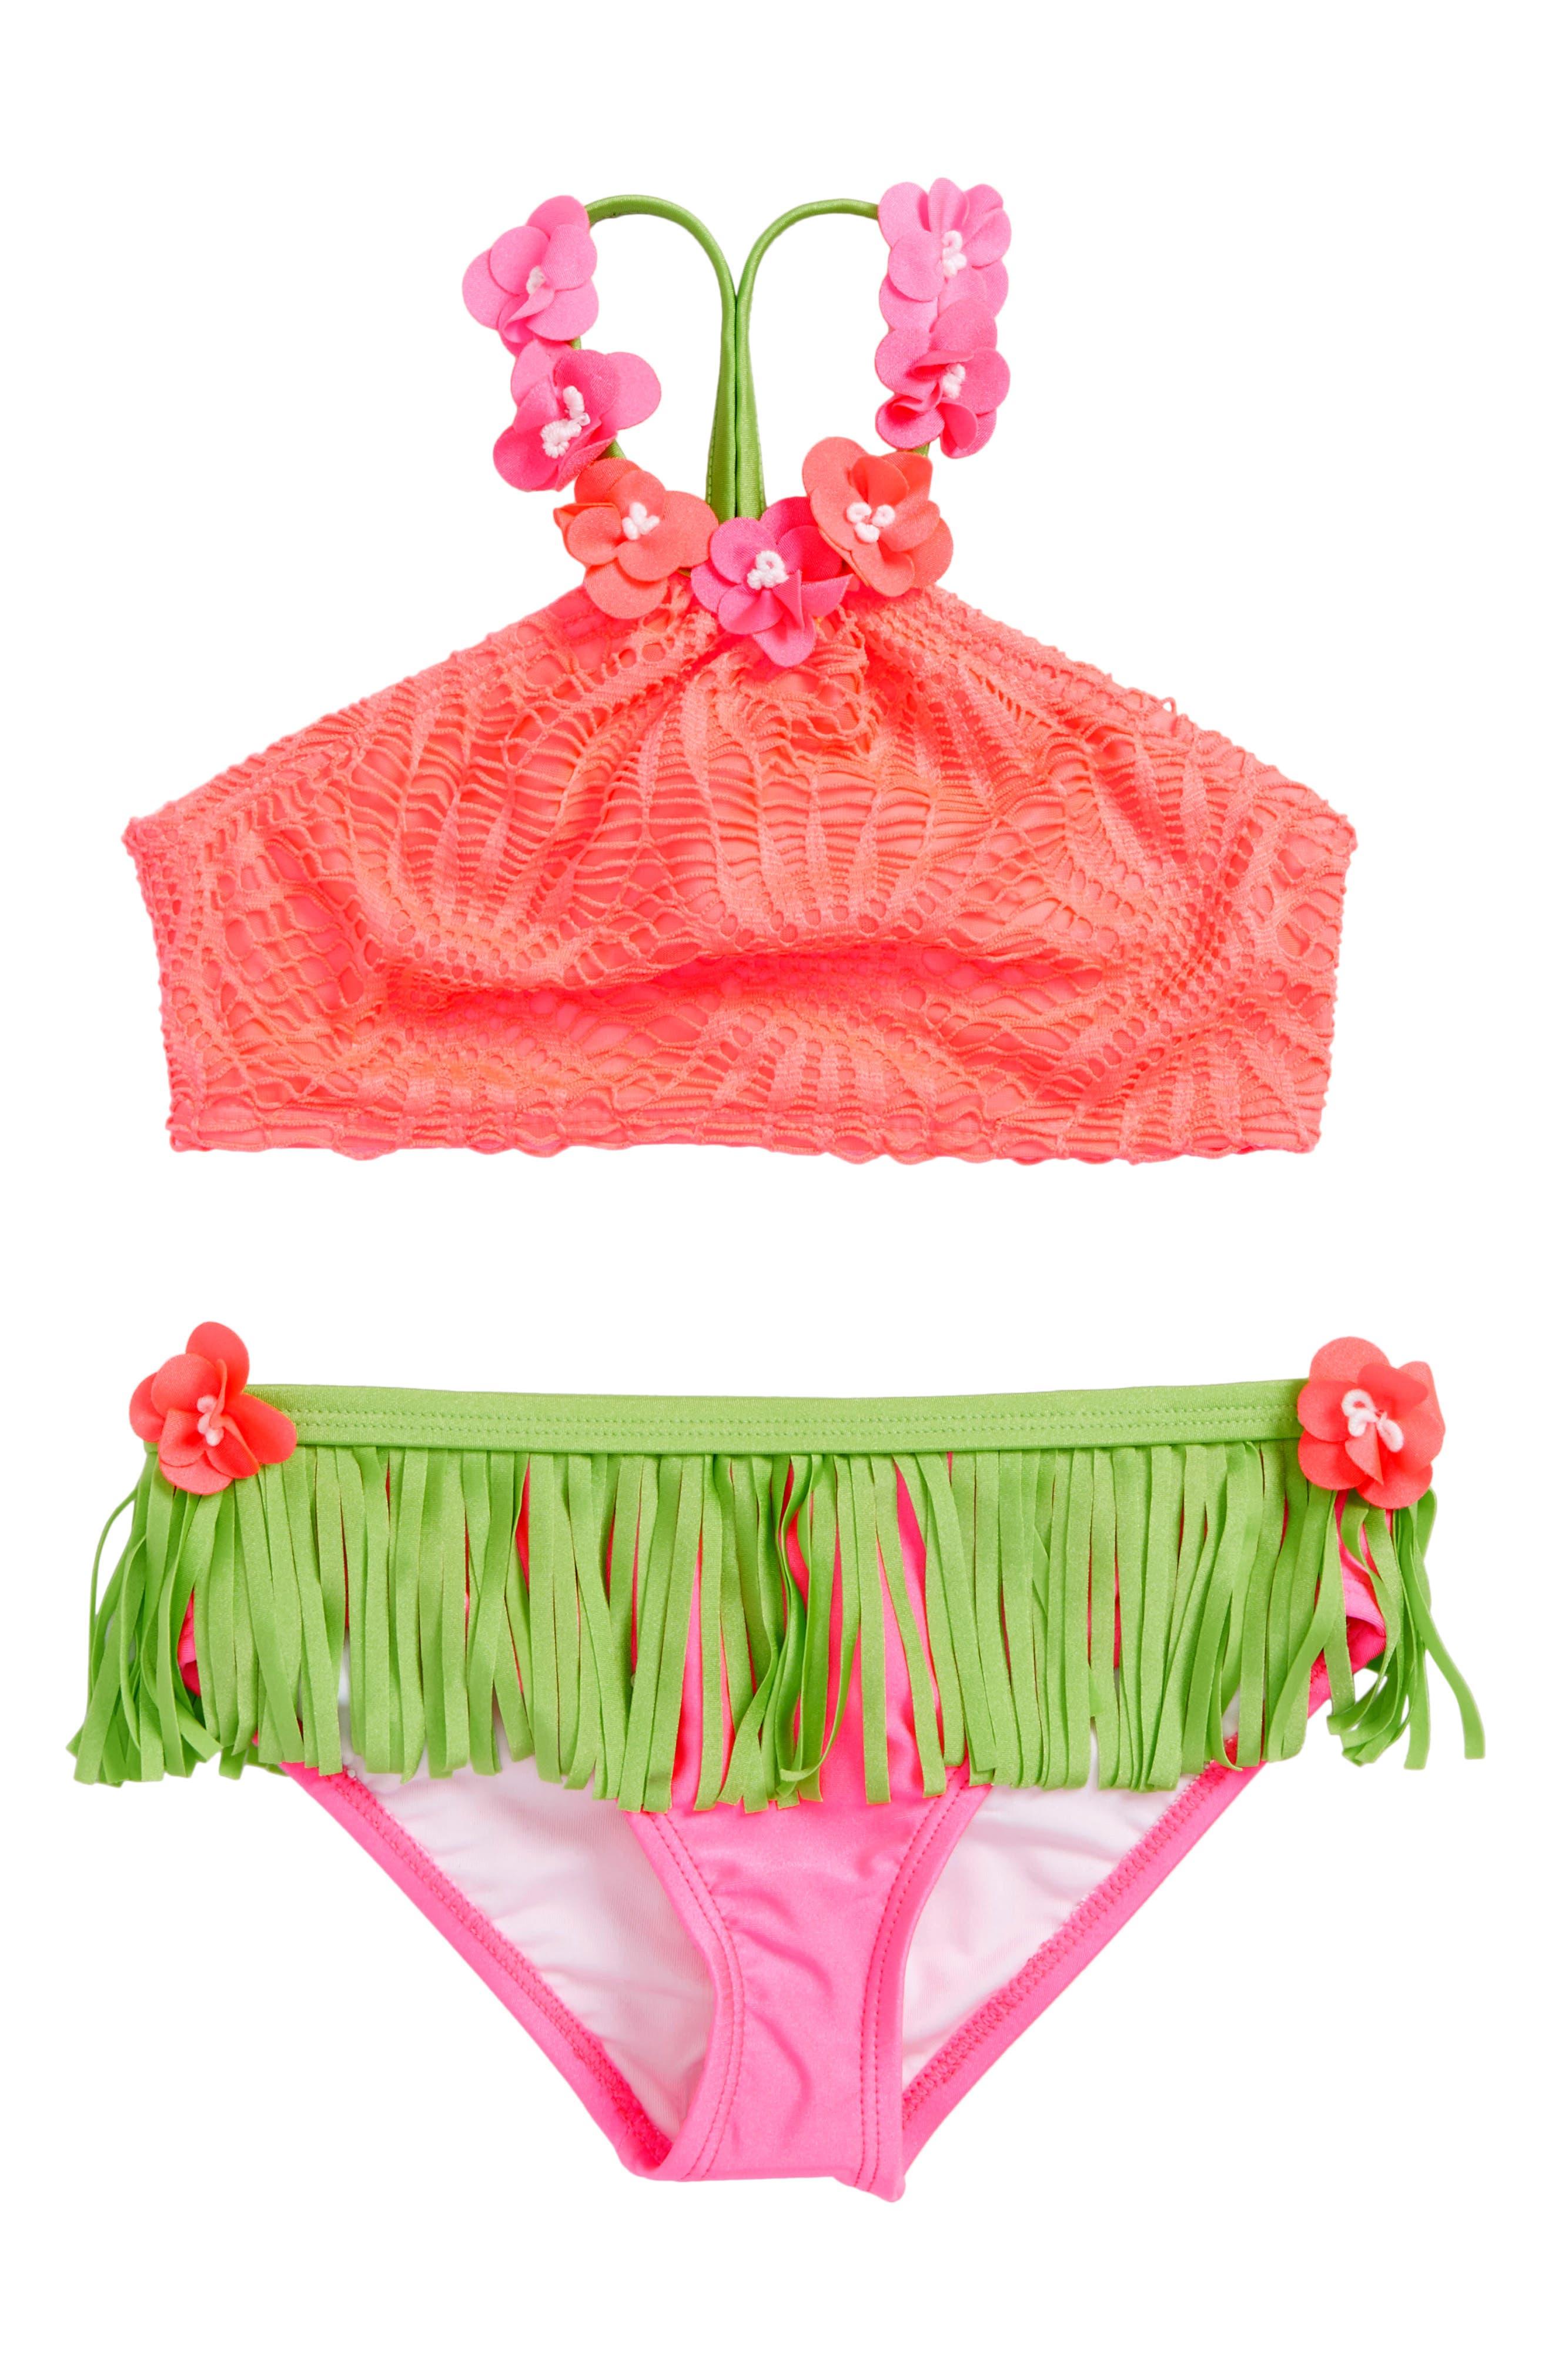 Hula Crochet Two-Piece Bikini Swimsuit,                             Main thumbnail 1, color,                             Coral Pink